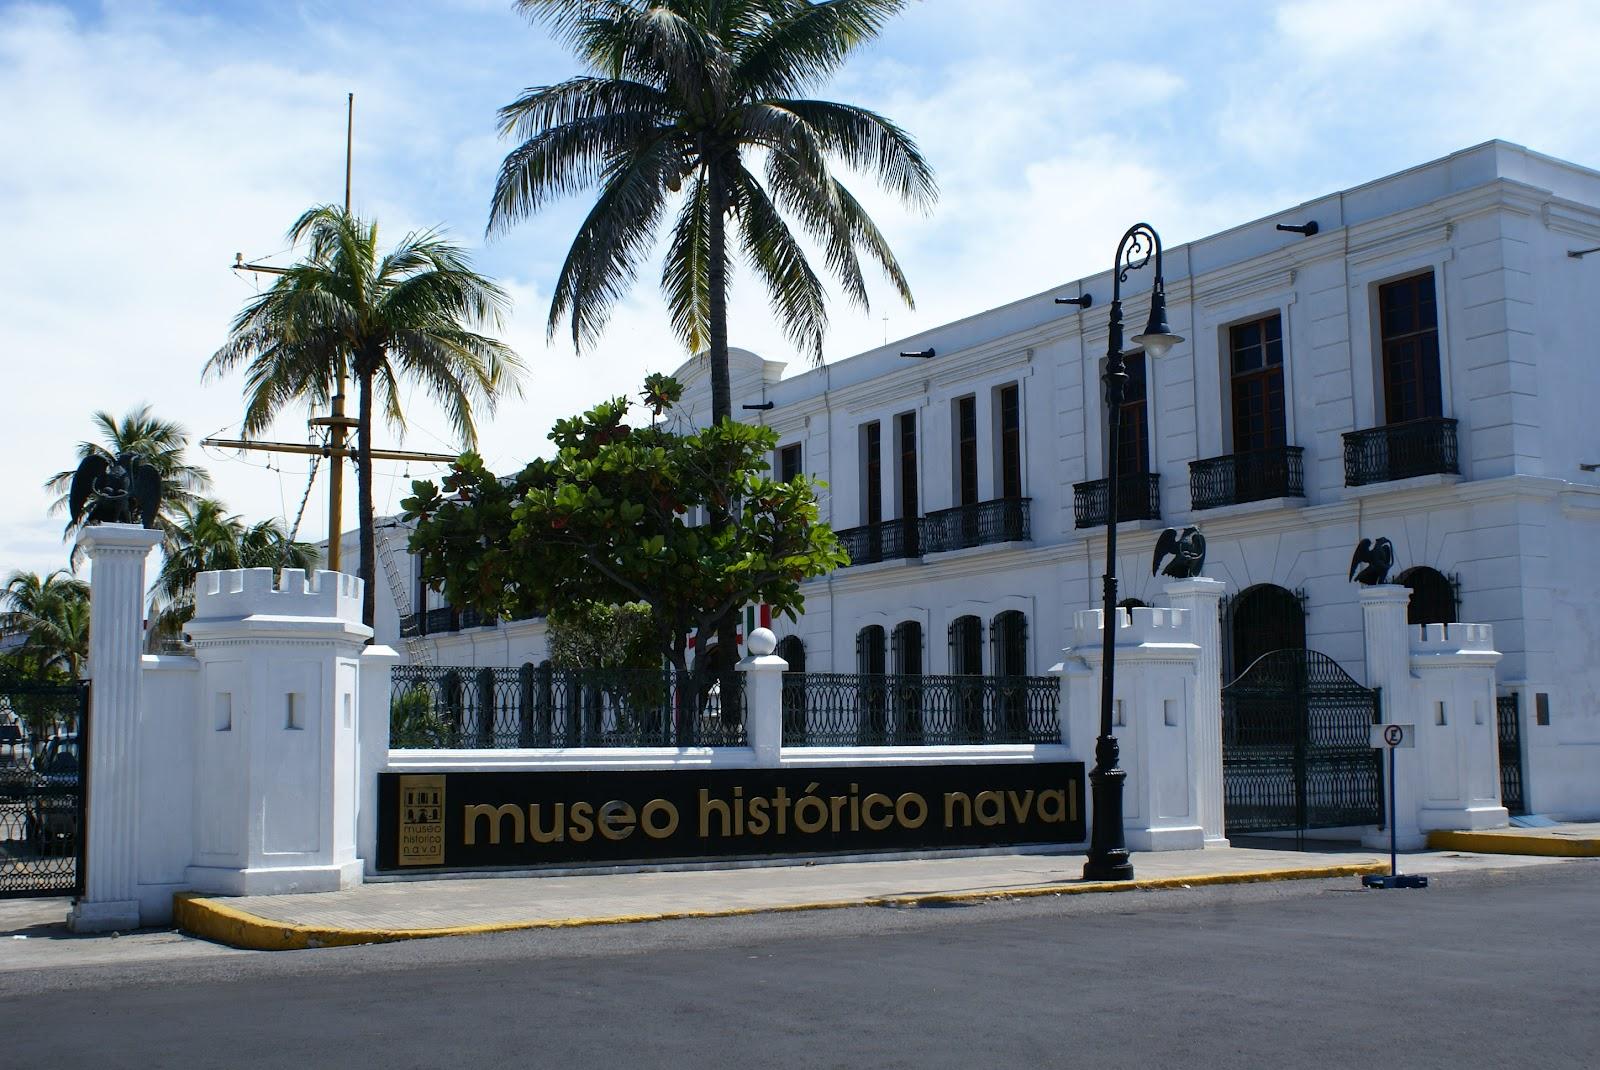 horarios de museo: